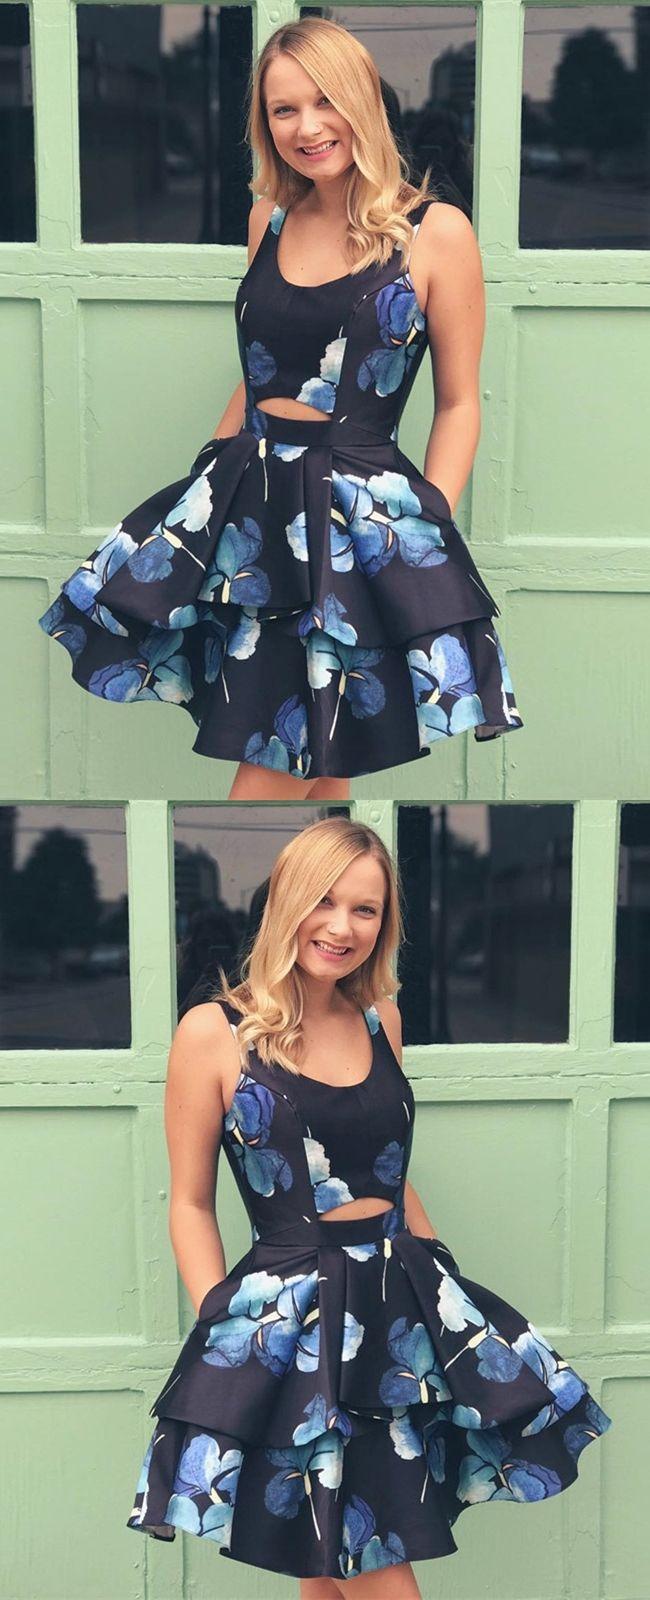 Aline scoop aboveknee navy blue printed homecoming dress with